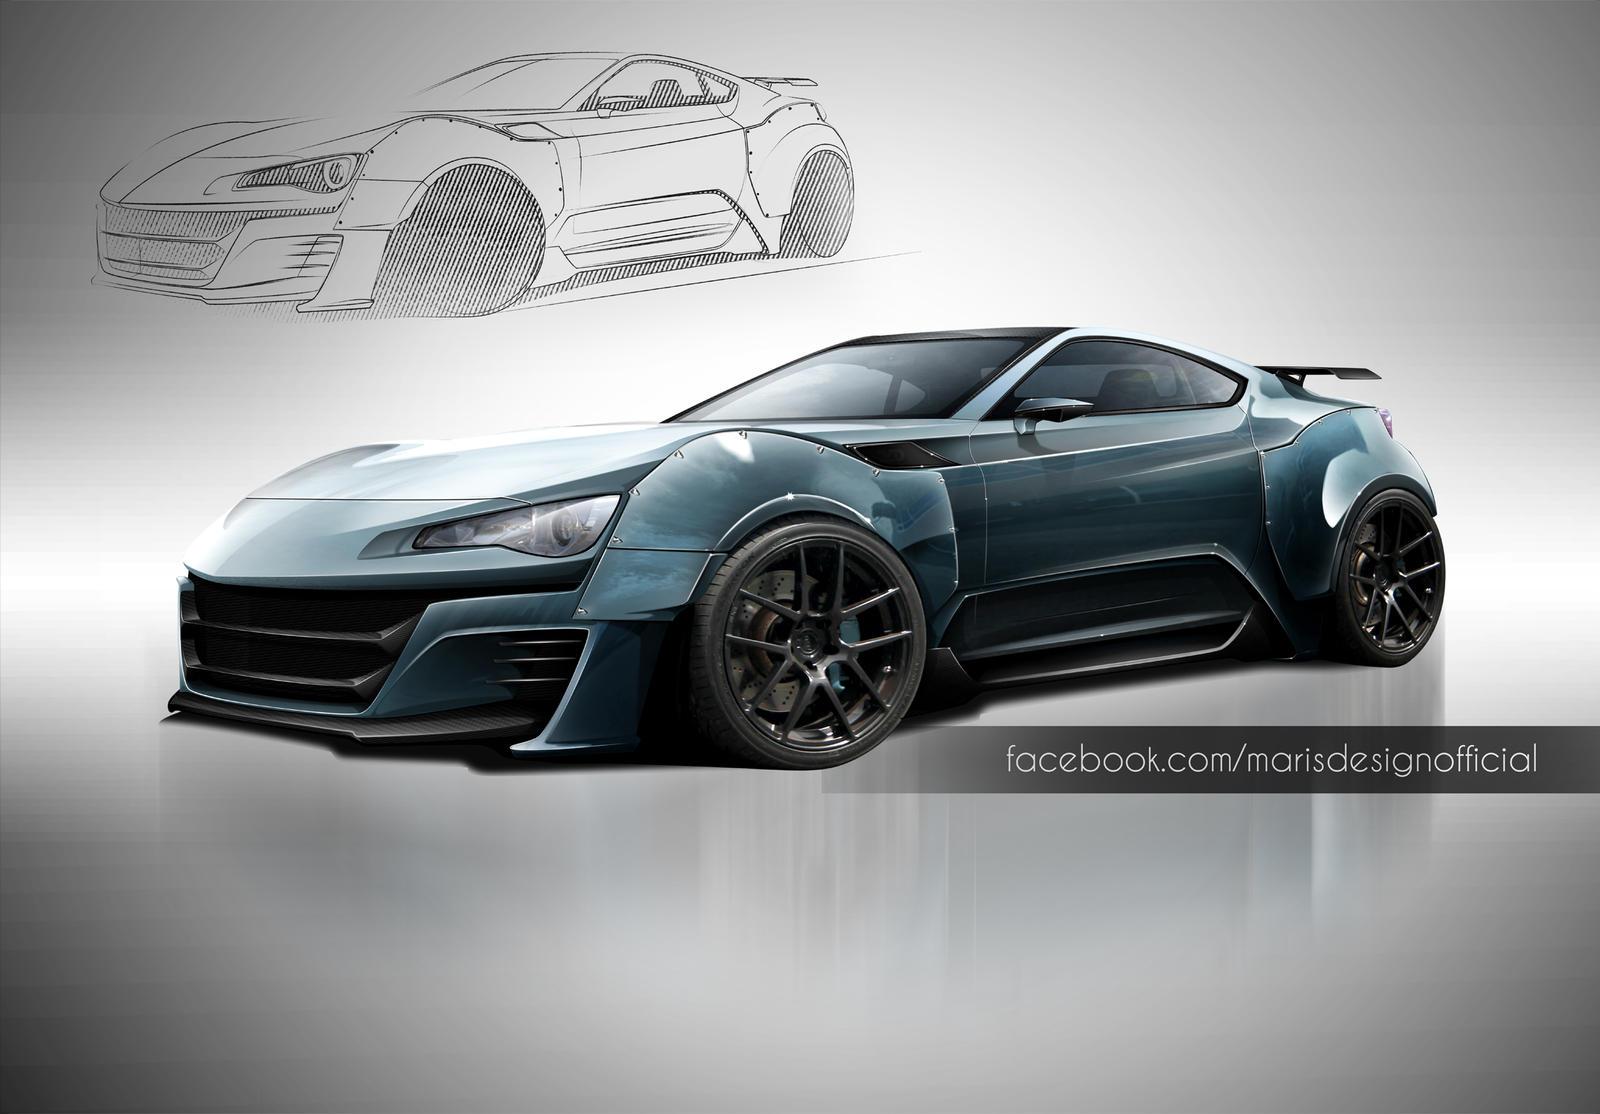 Gt86 Supercar Concept Render by MarisDesign